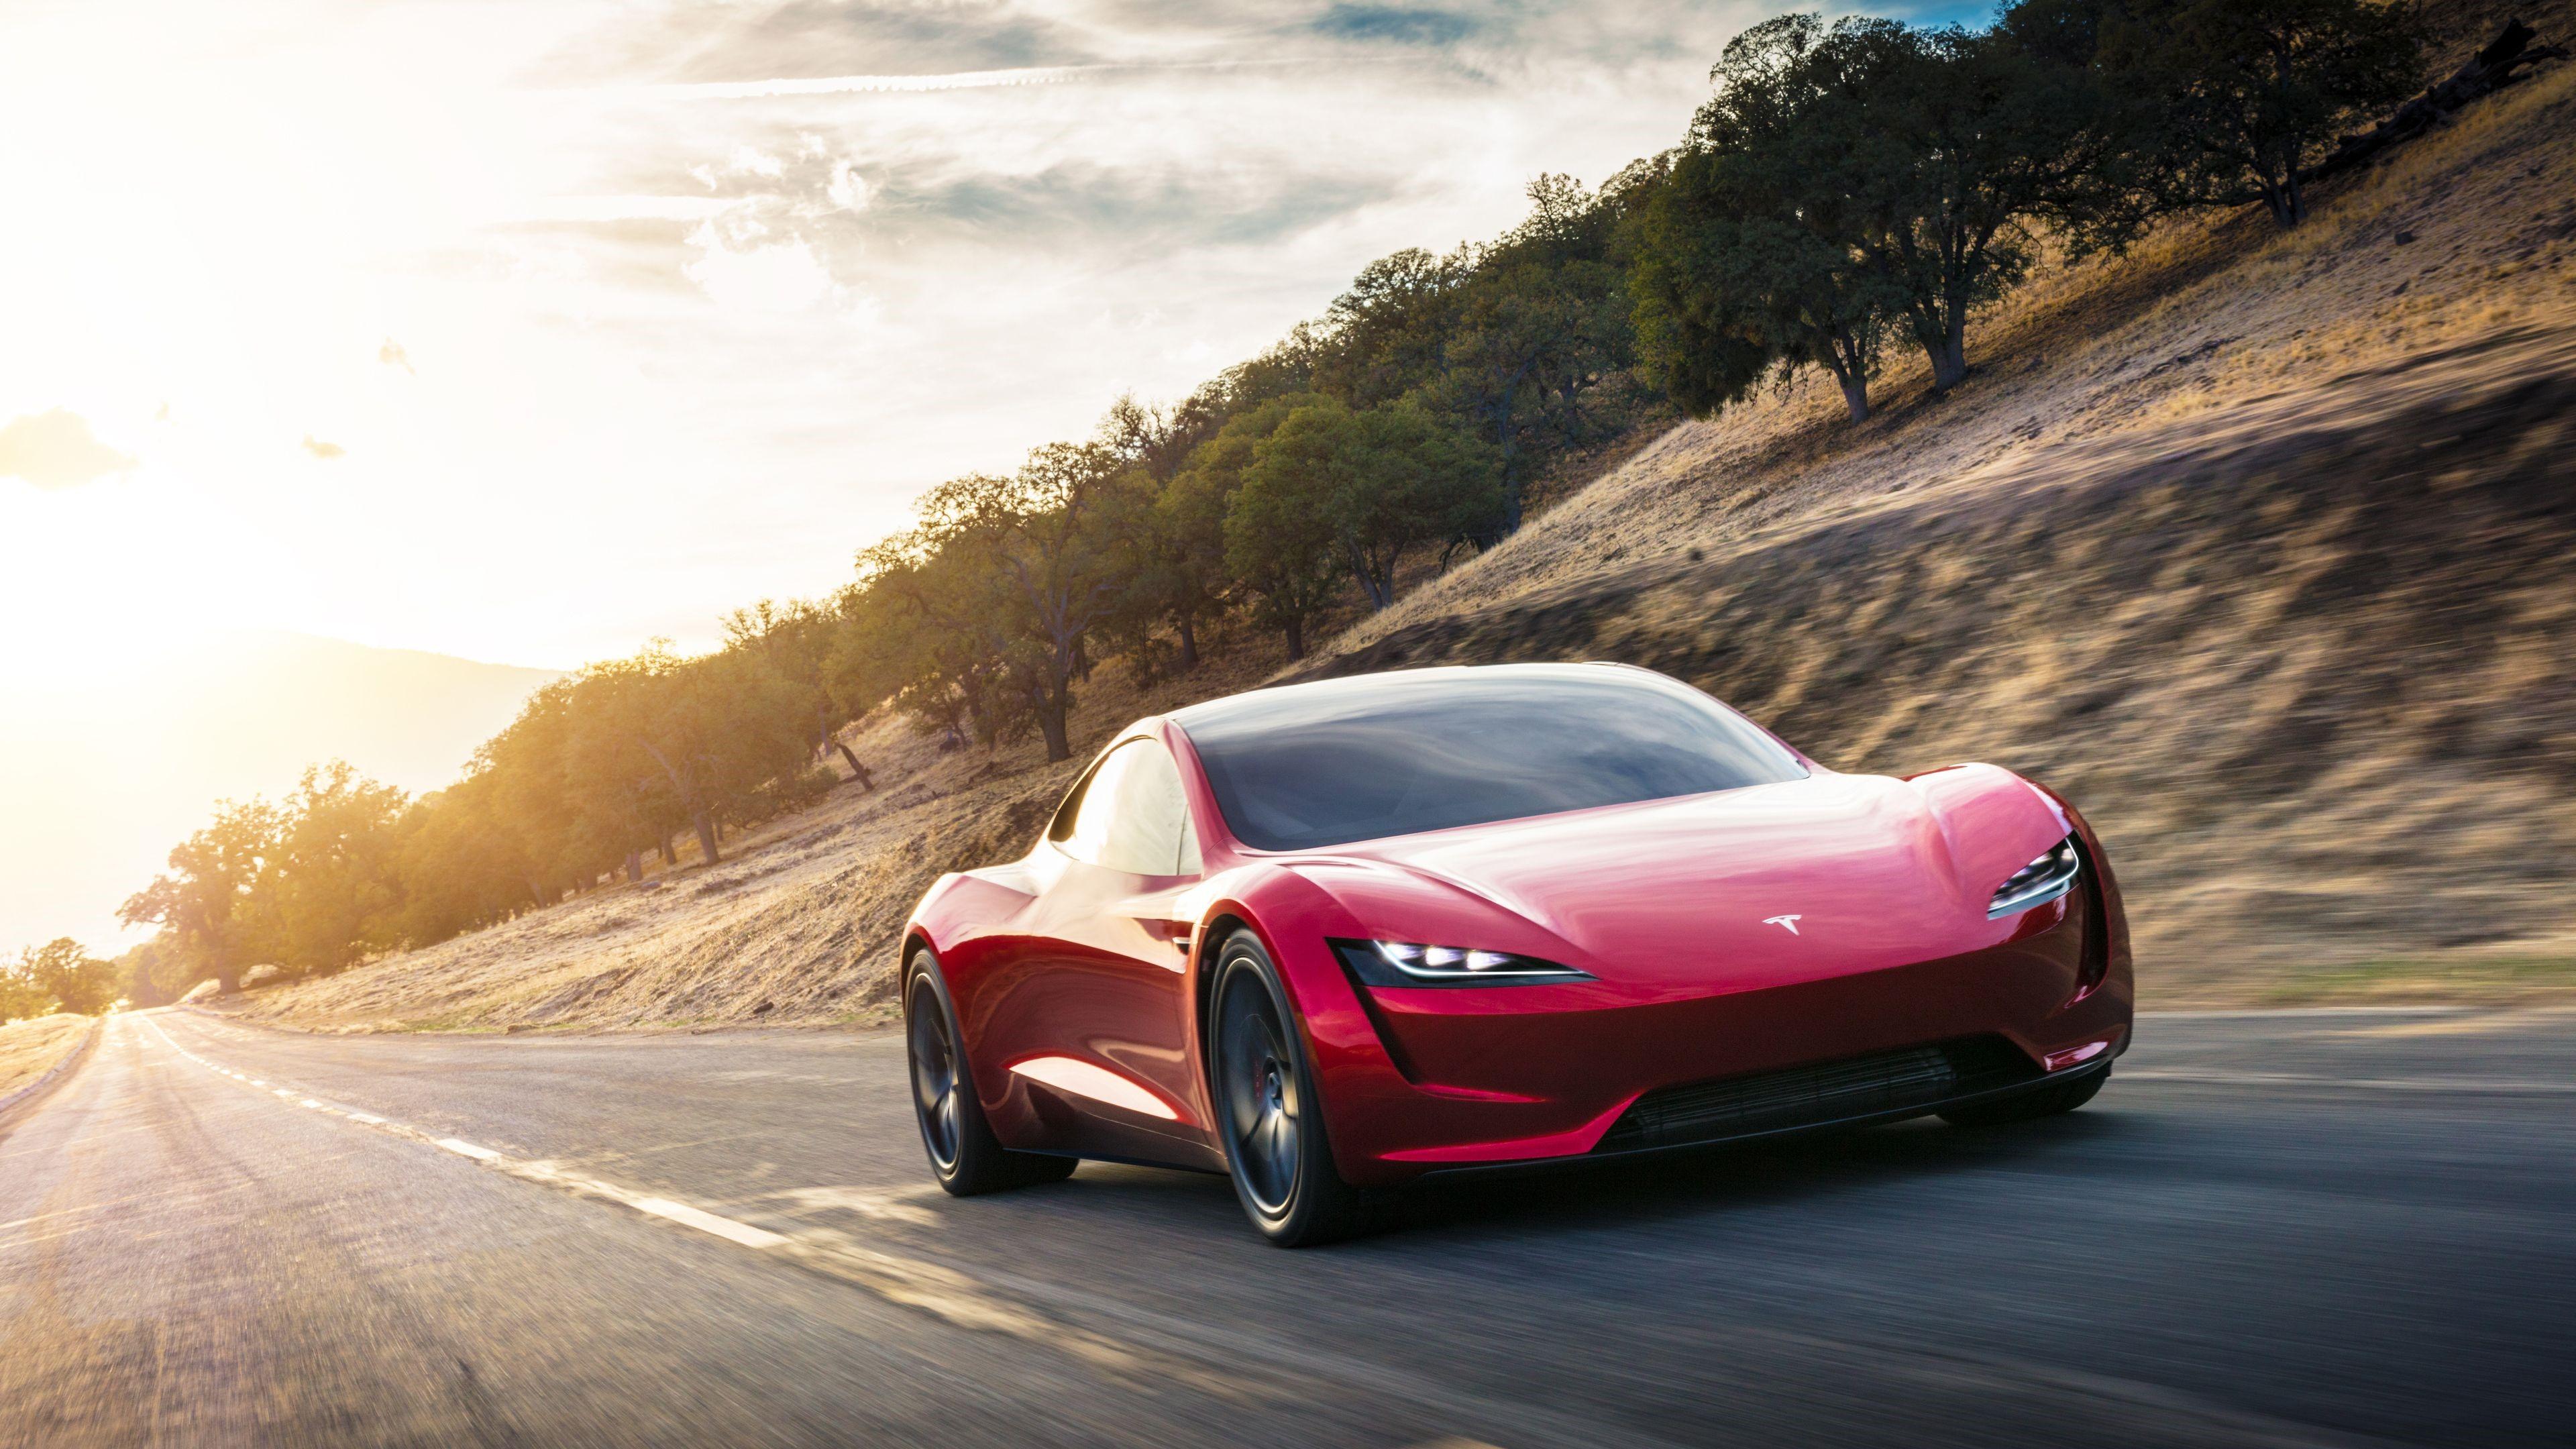 Tesla Roadster Wallpapers